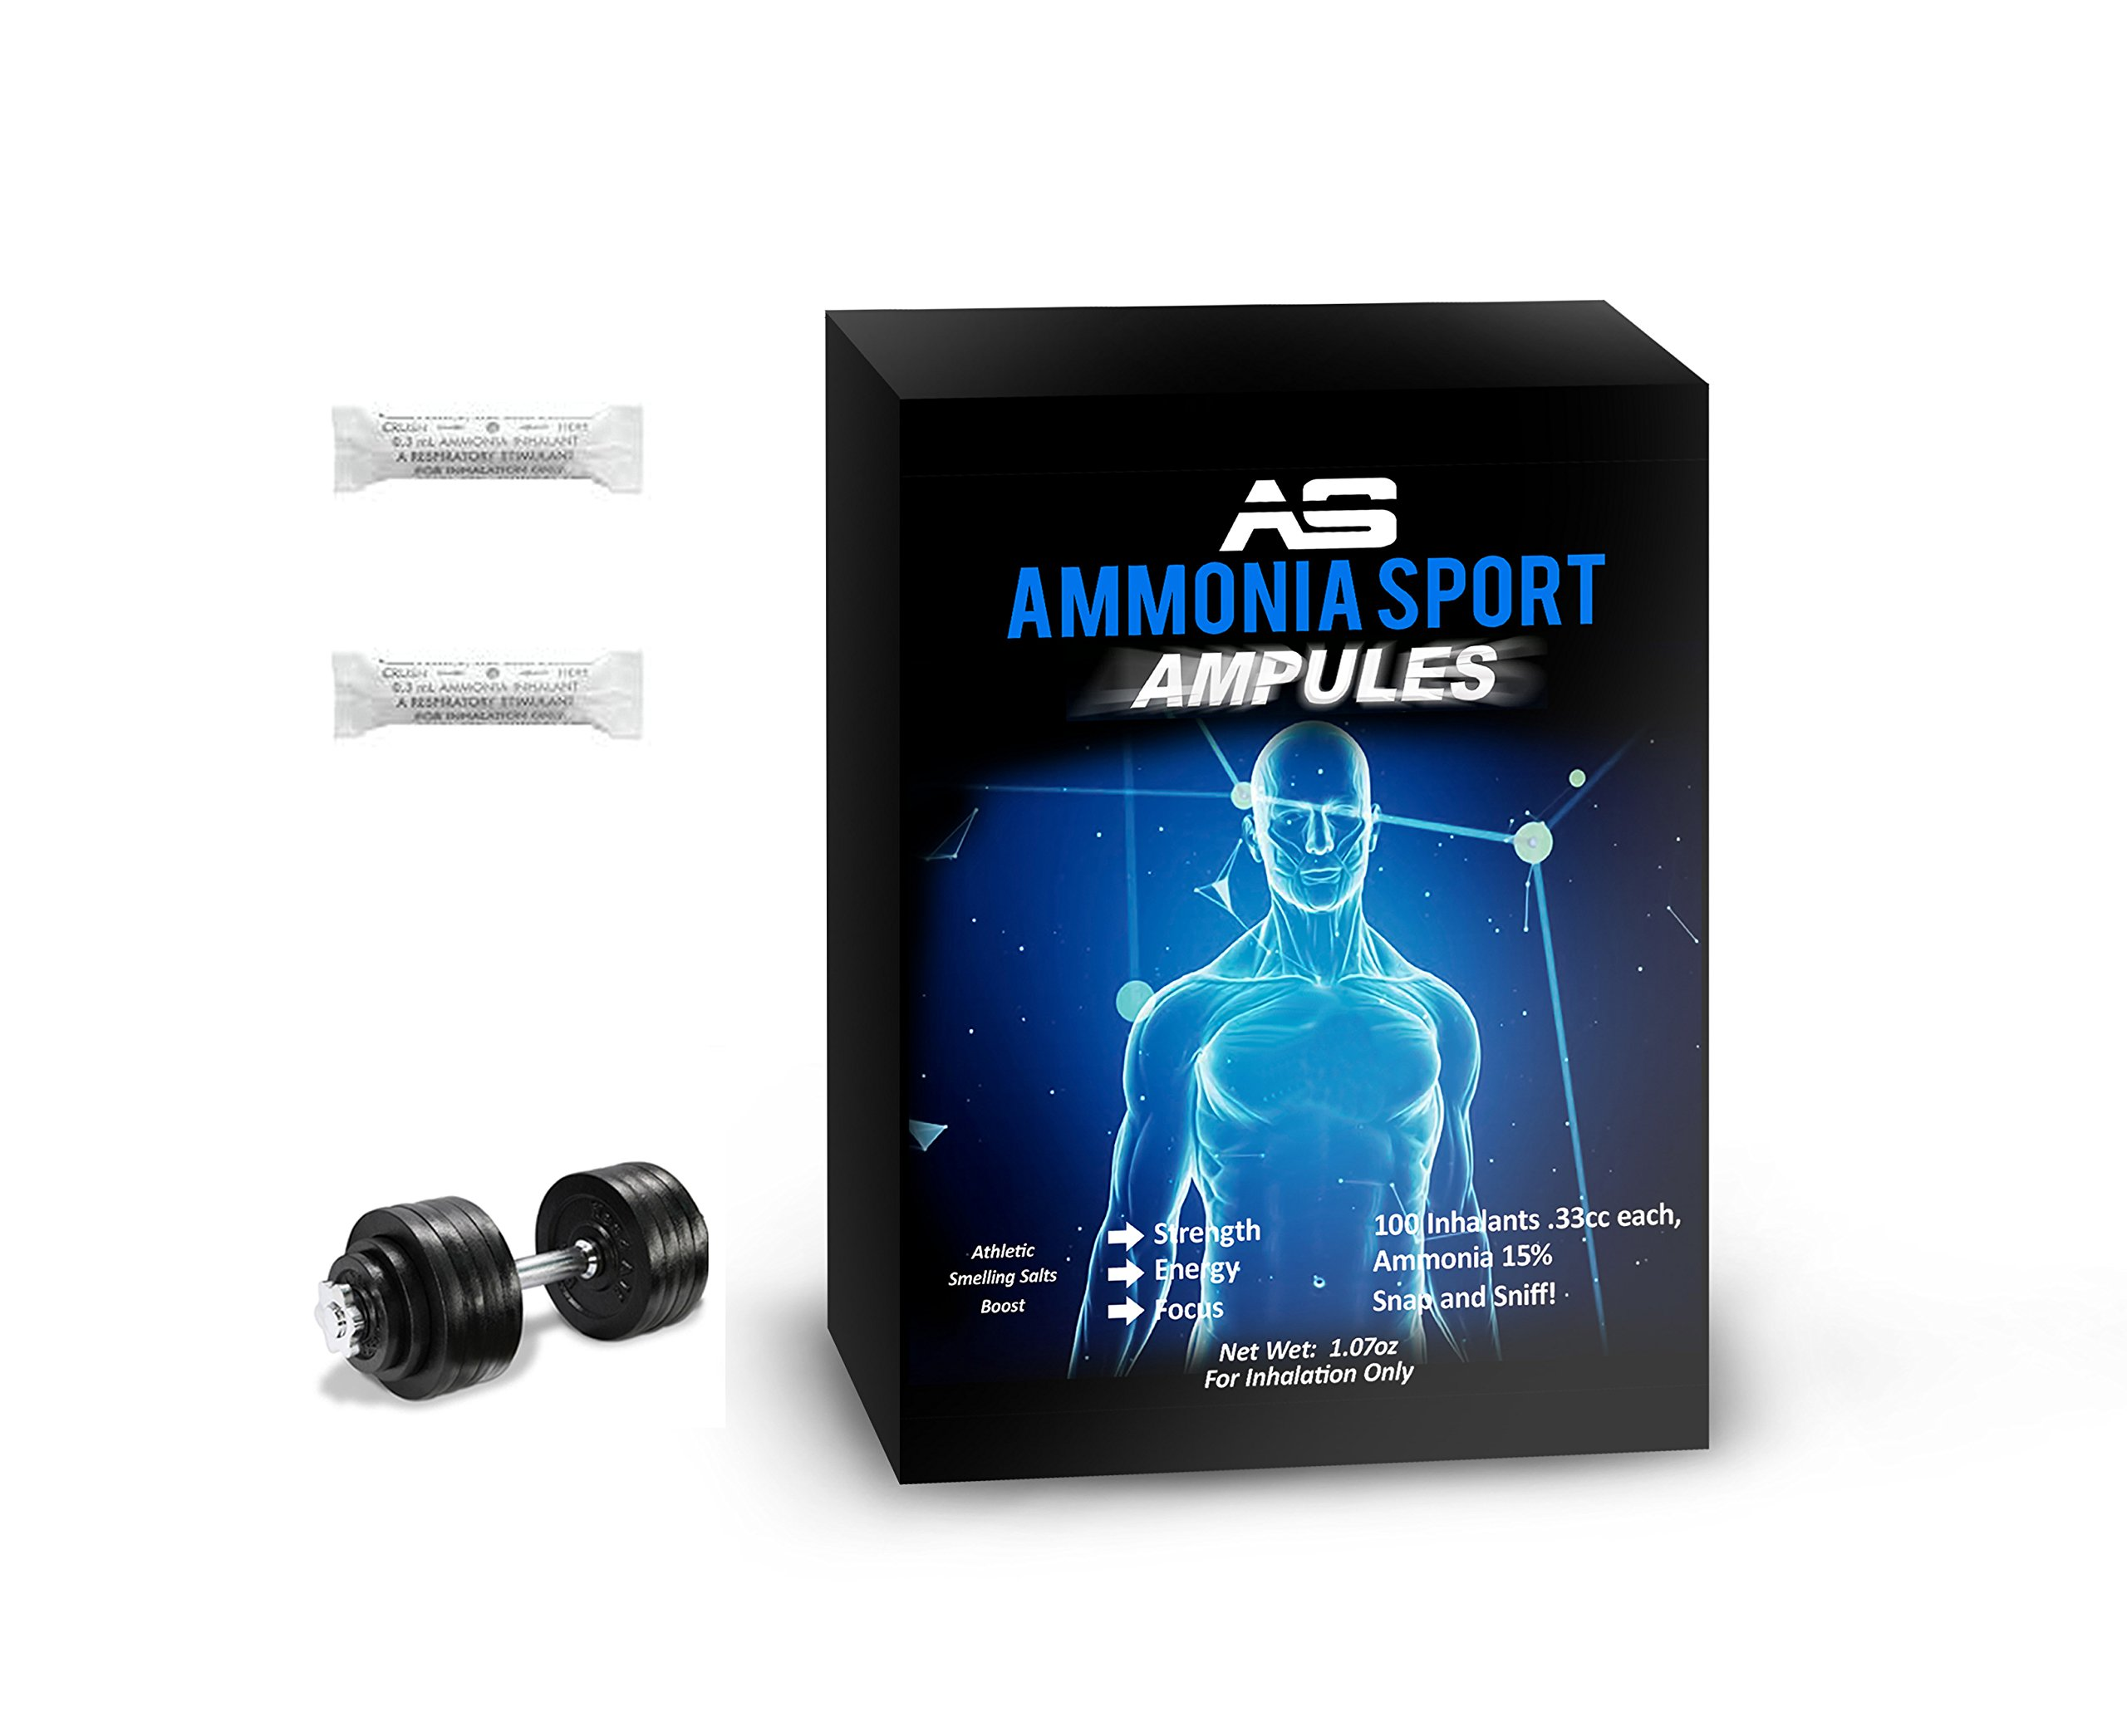 AmmoniaSport Athletic Smelling Salts - Ampules (100) - Ammonia Inhalant [Smelling Salt / Ammonia Inhalants]